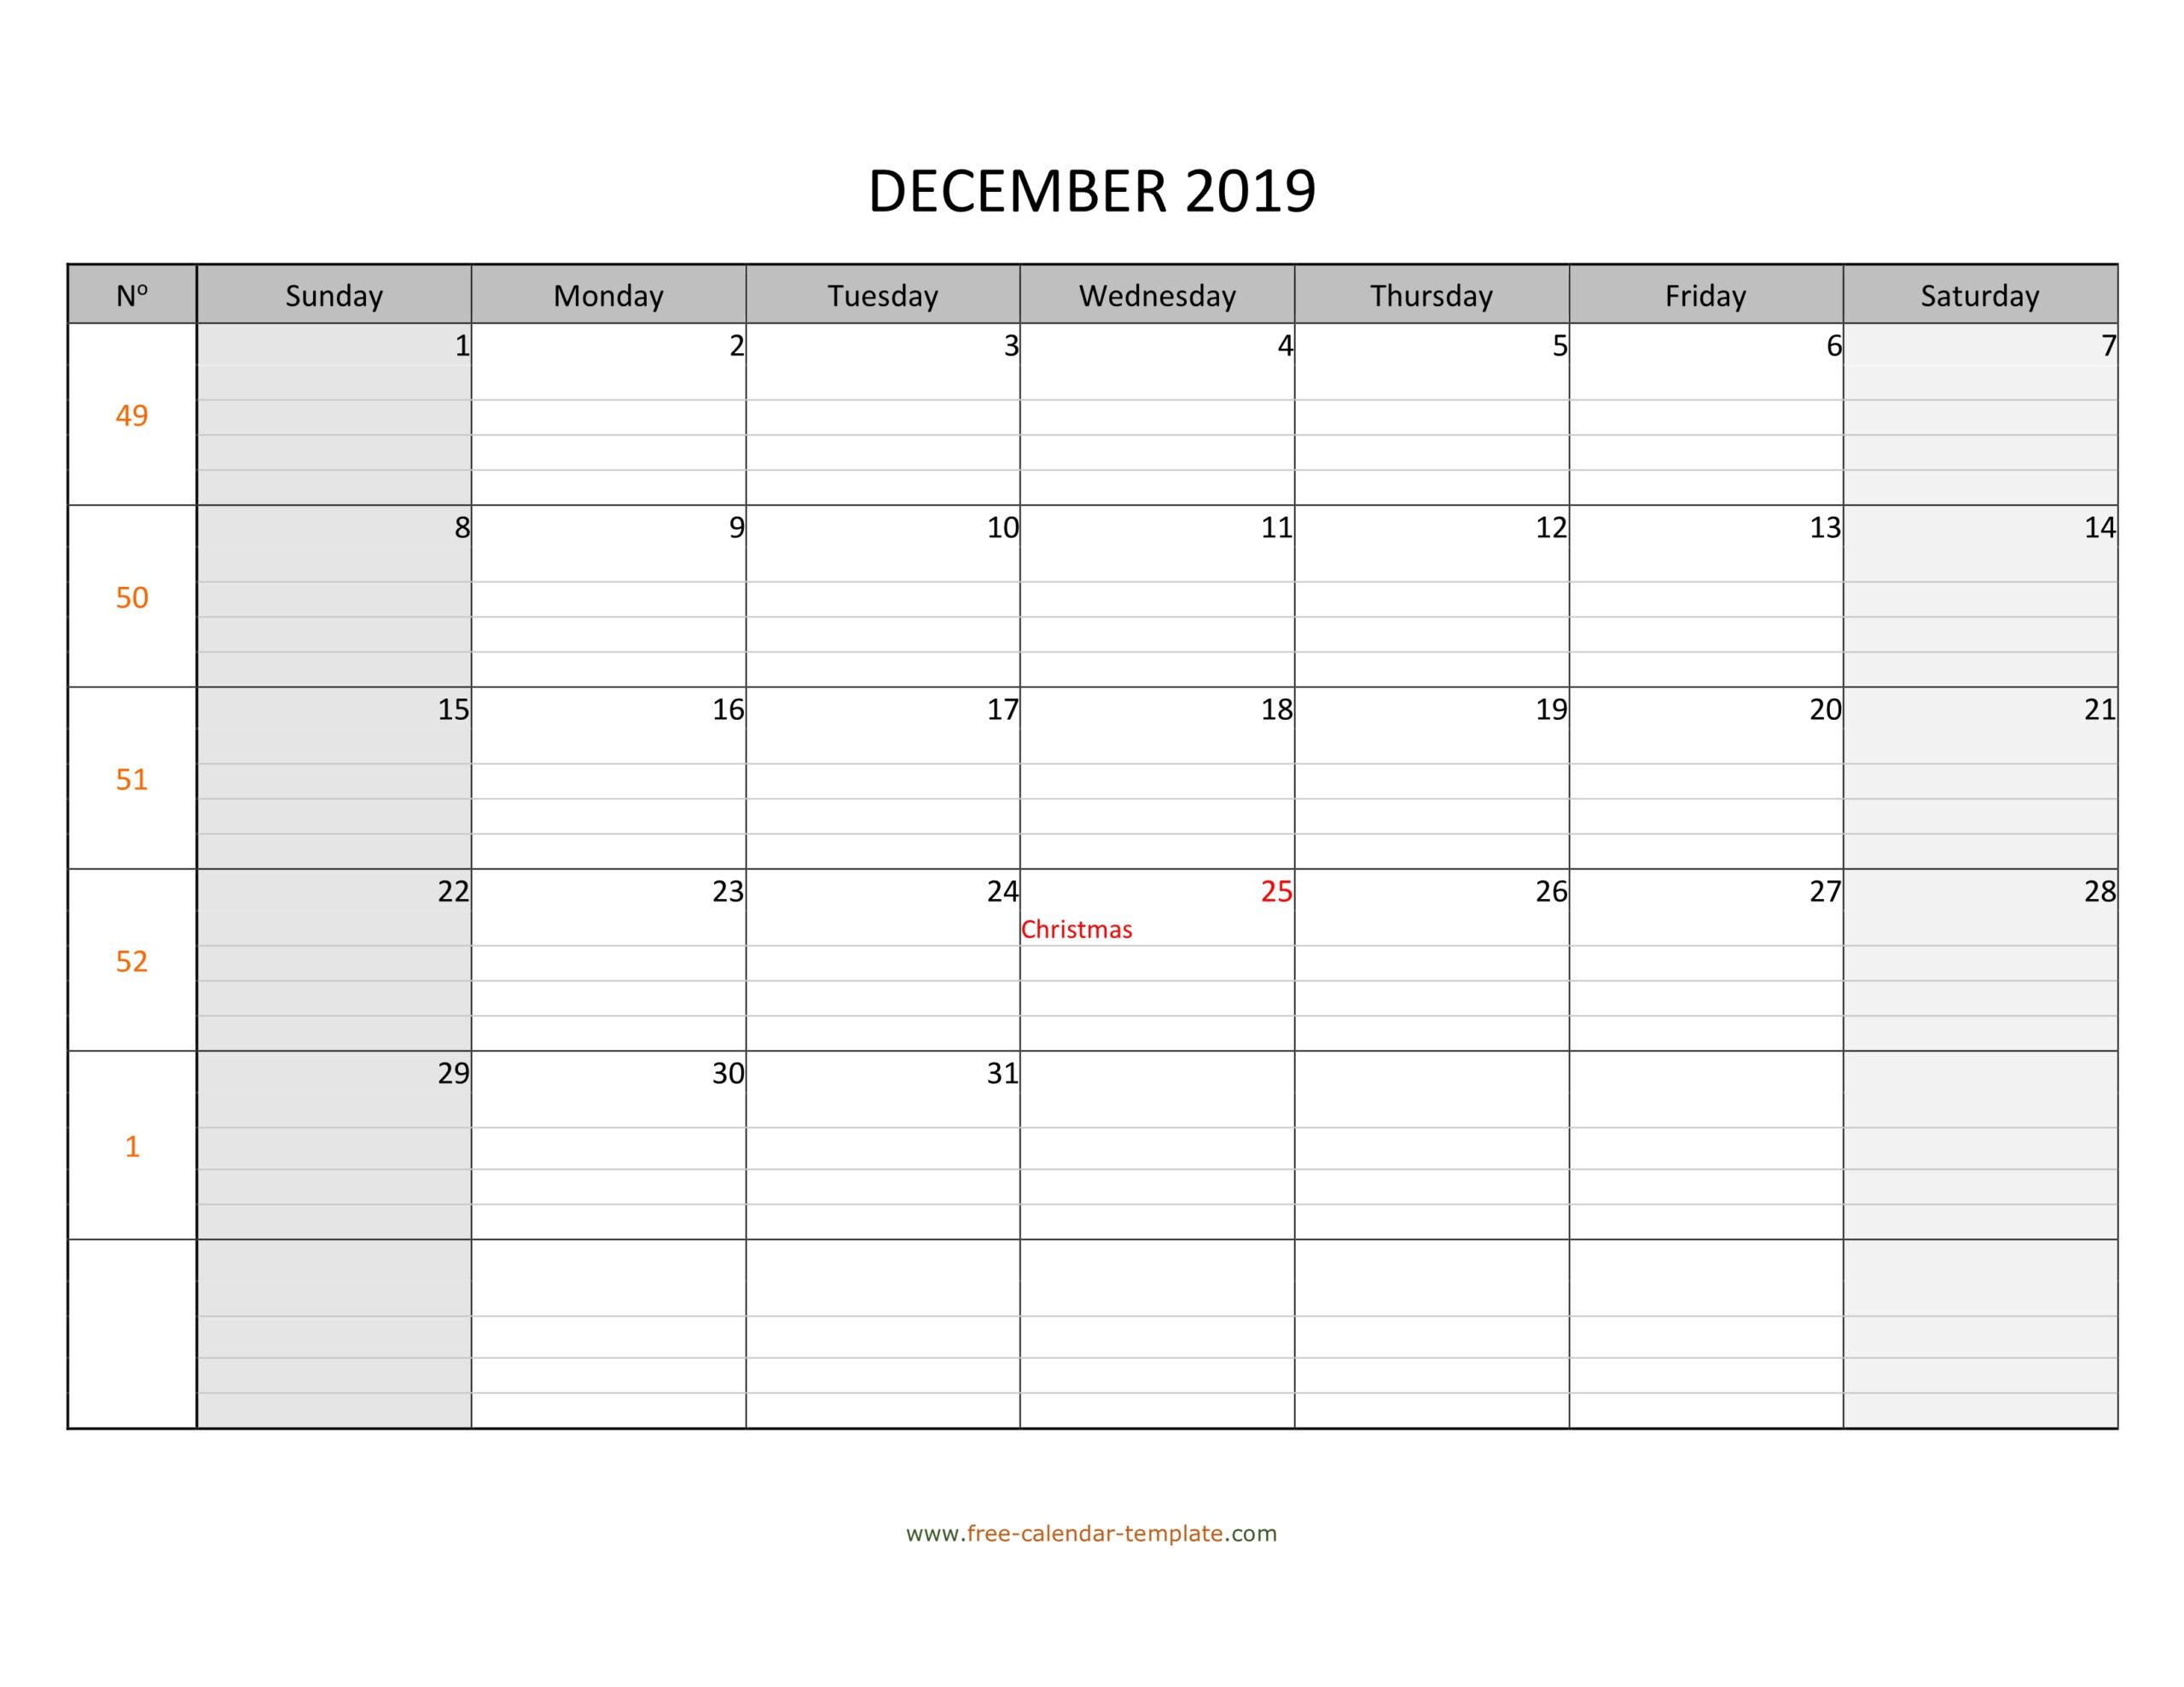 December 2019 Calendar Free Printable With Grid Lines in Free Printable Monthly Calendar Pages With Lines